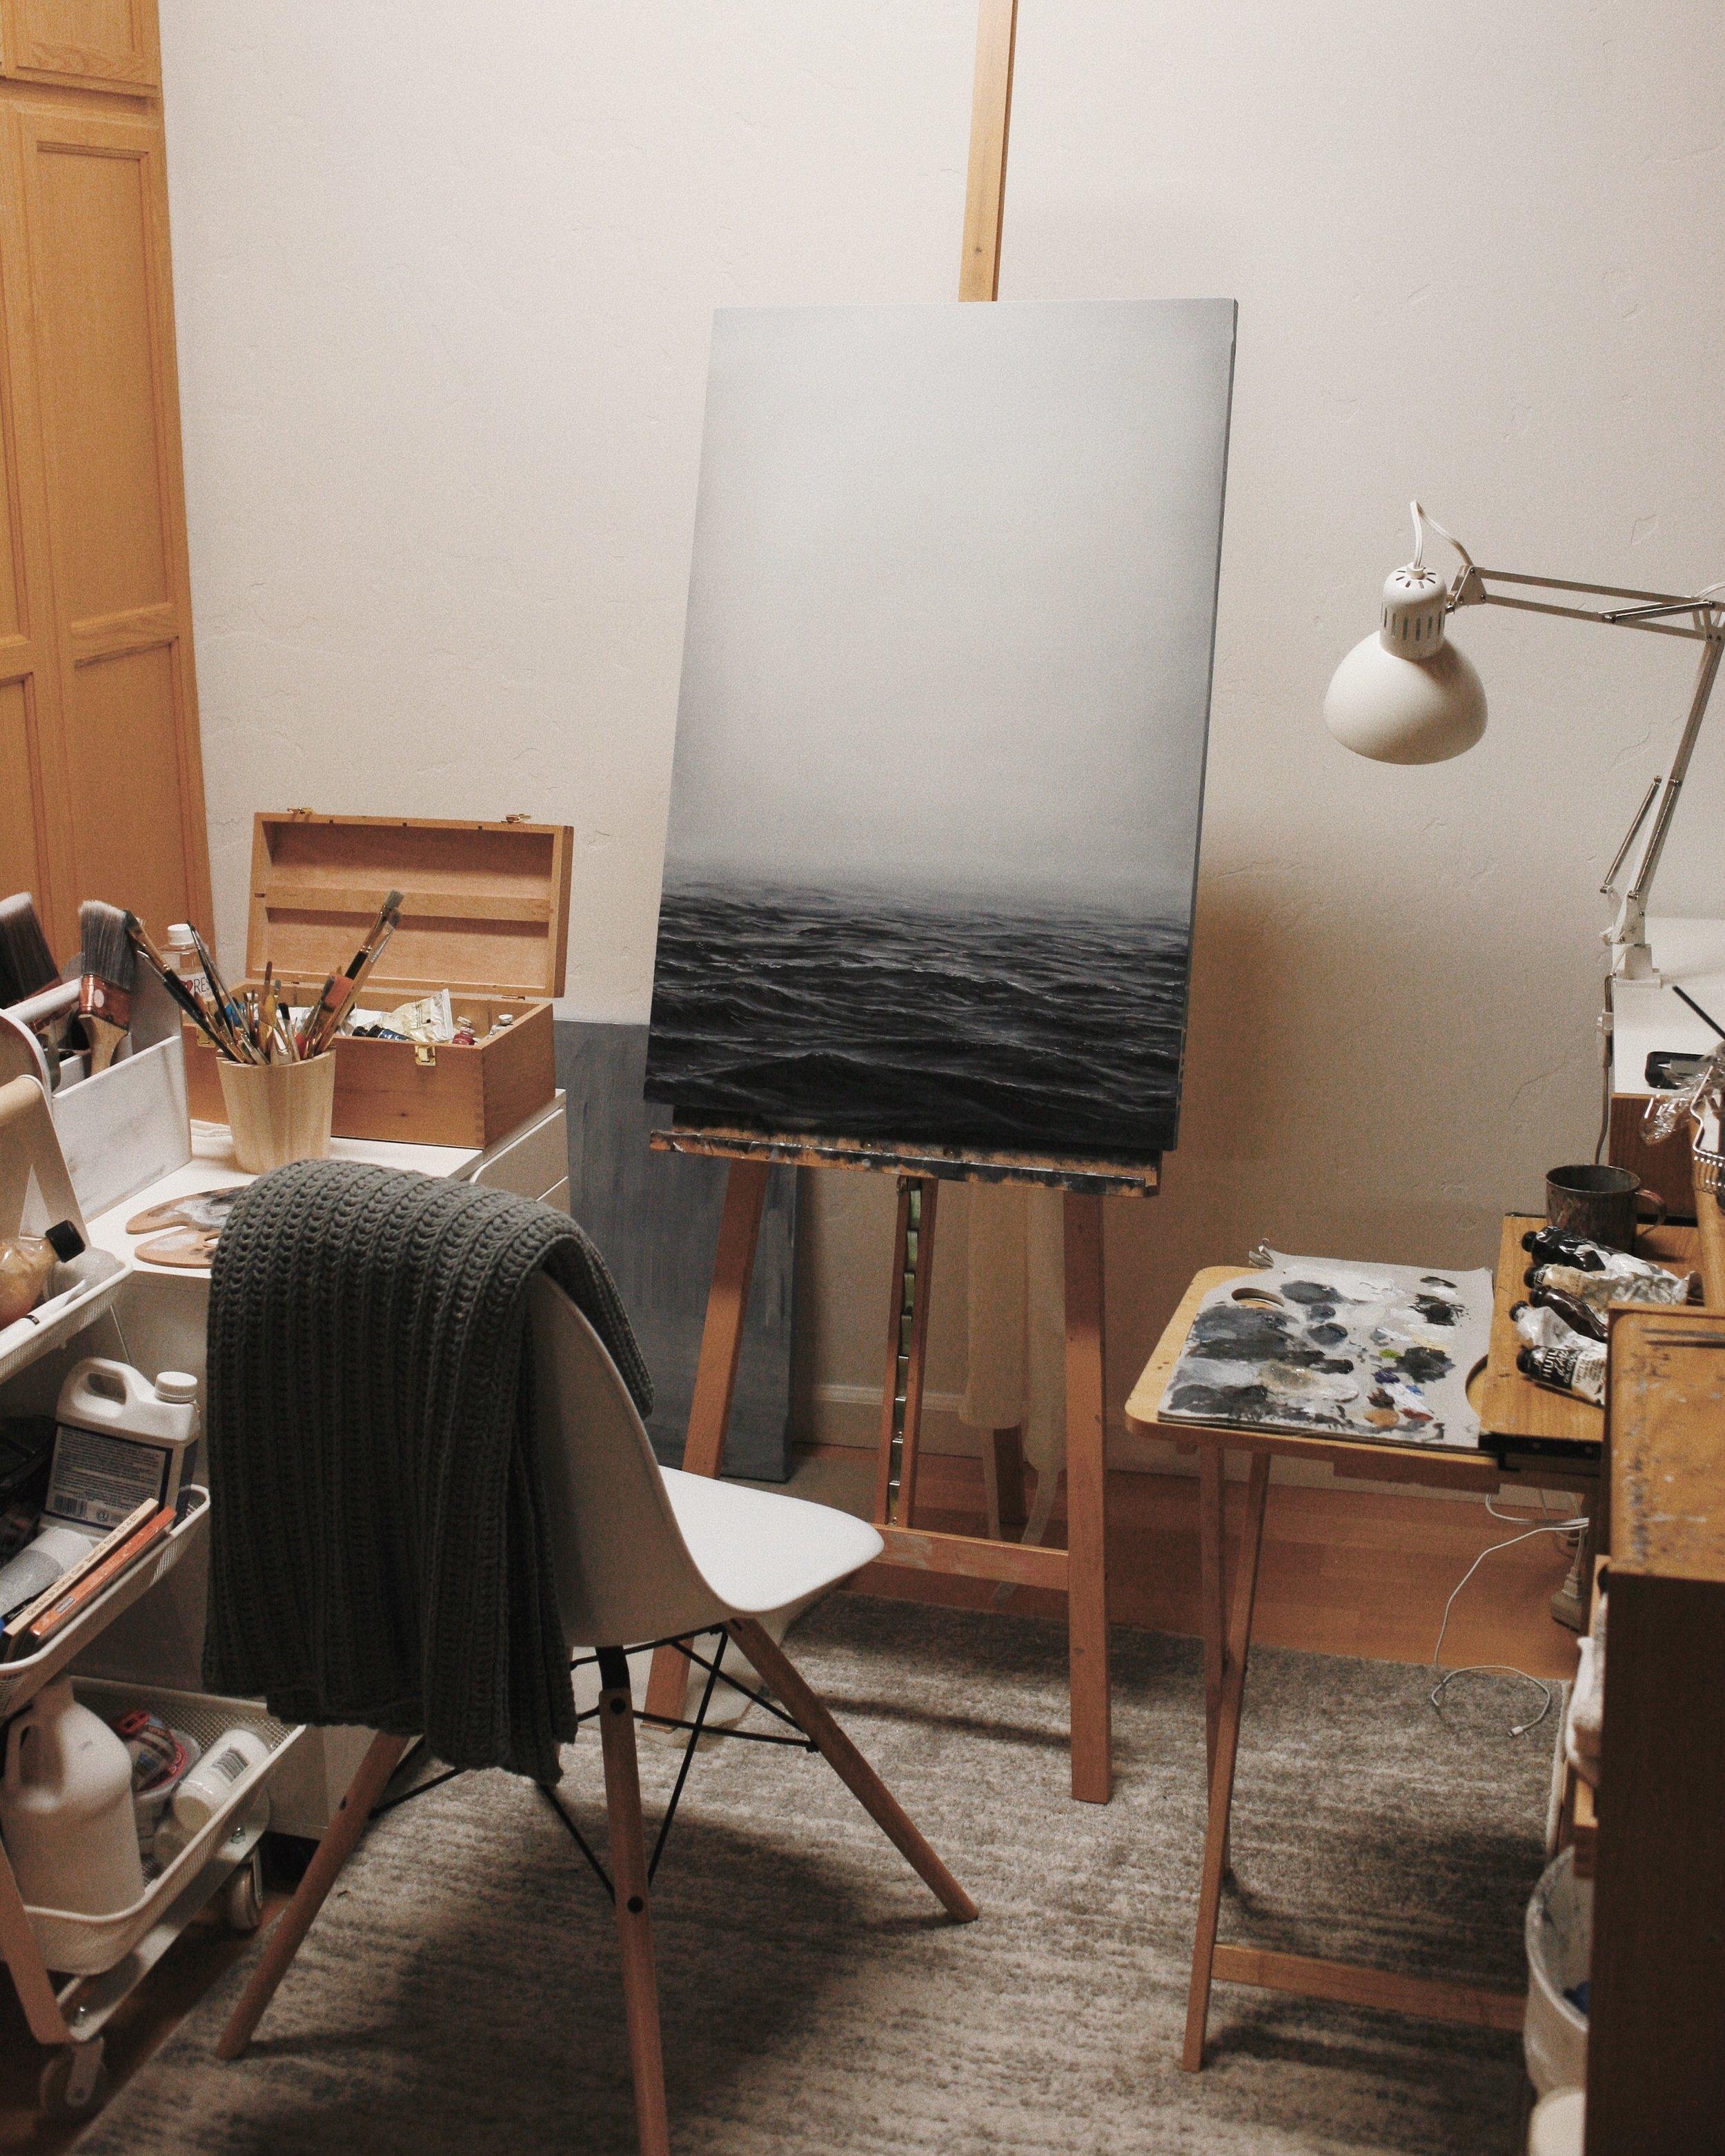 Beau Bernier Frank - Artist Studio